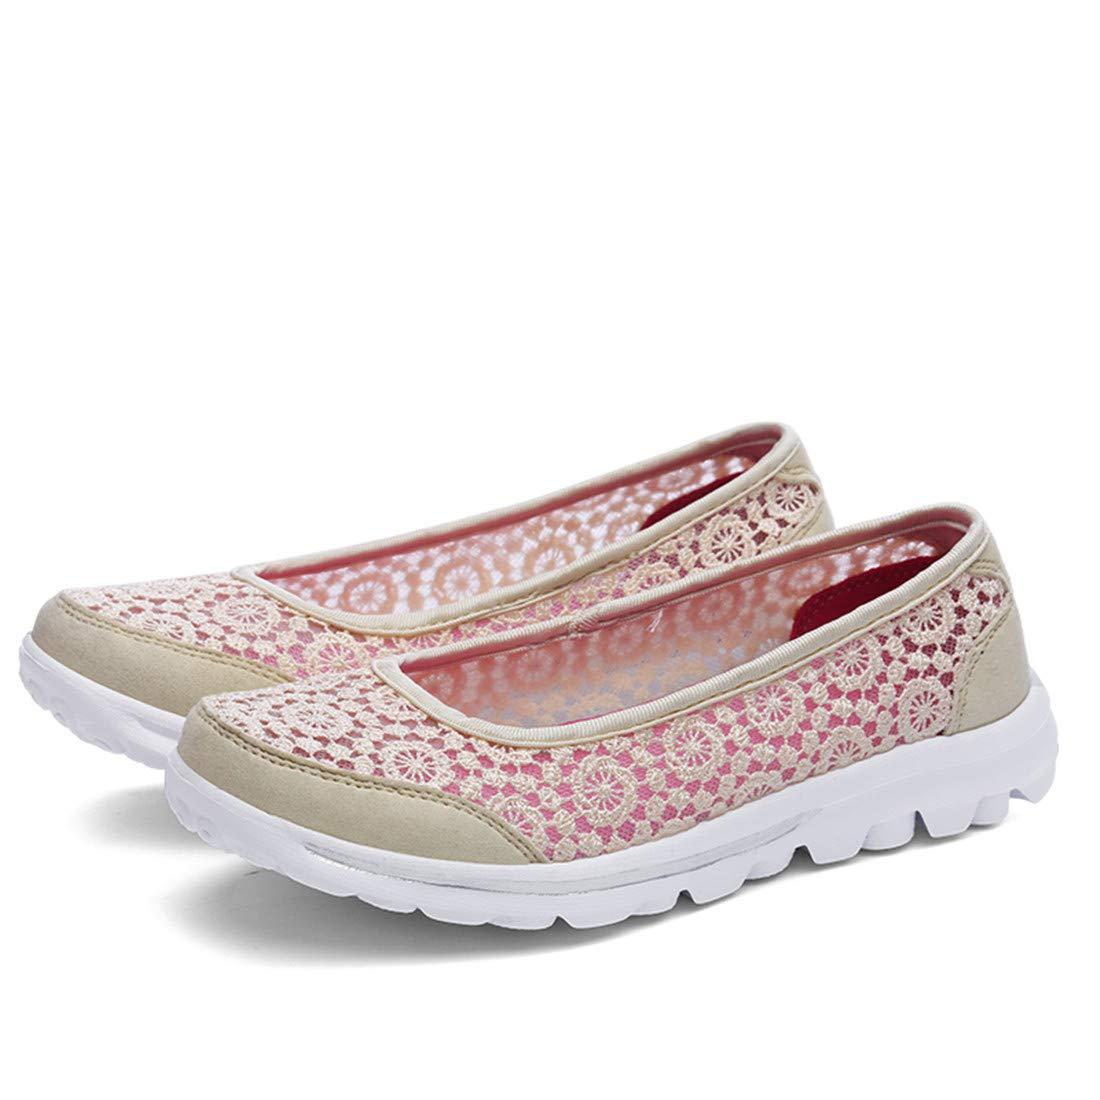 JIFENGJIANHAOブラストJianハオレースシルク中空靴軽量MDソールセットフットシューズファッション母シューズ